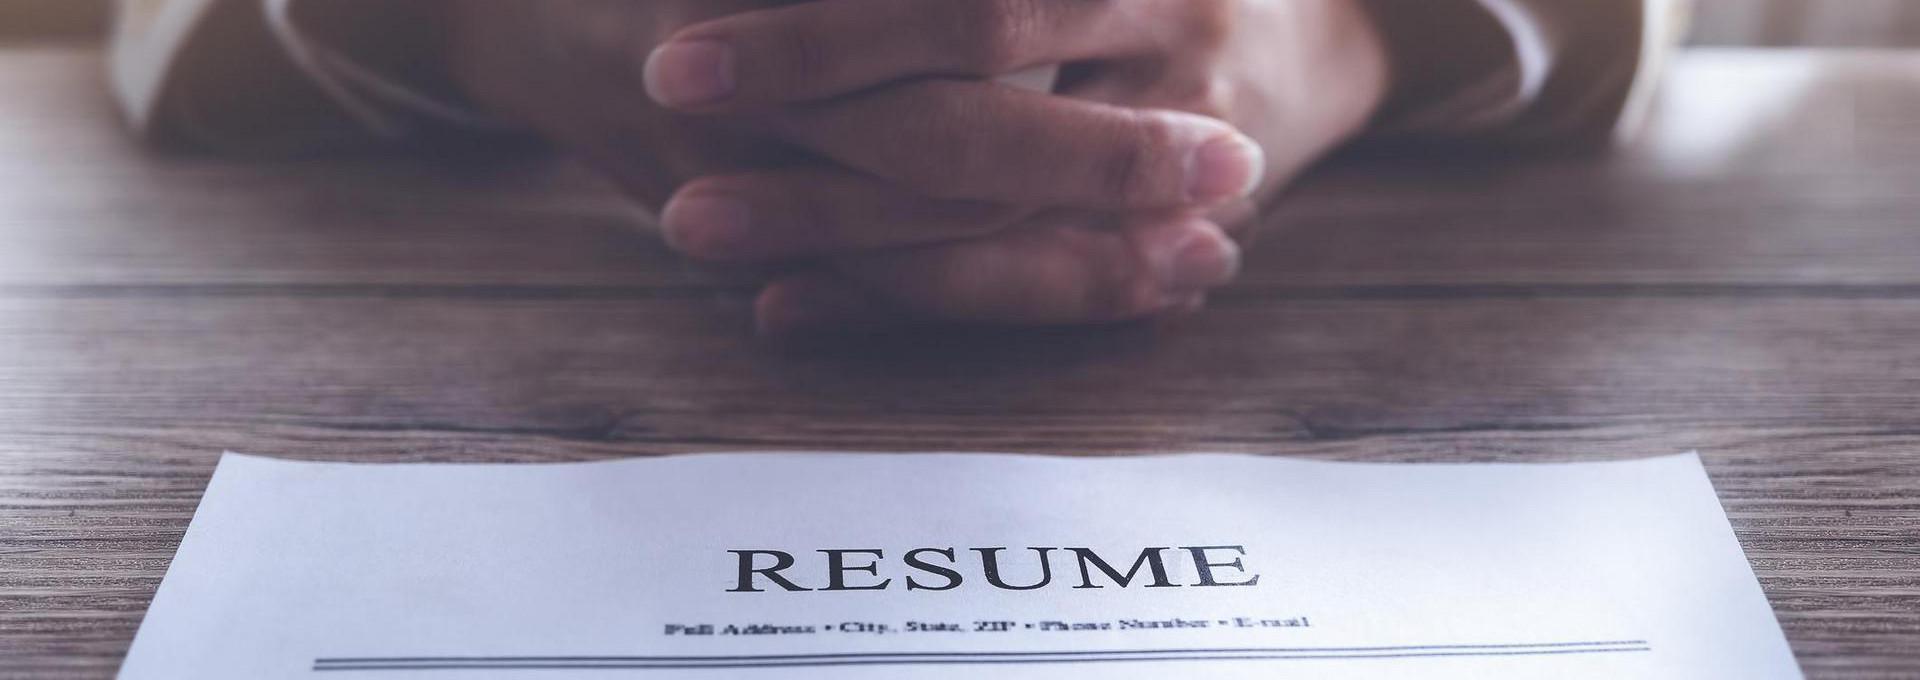 Resume Verification - info-hero